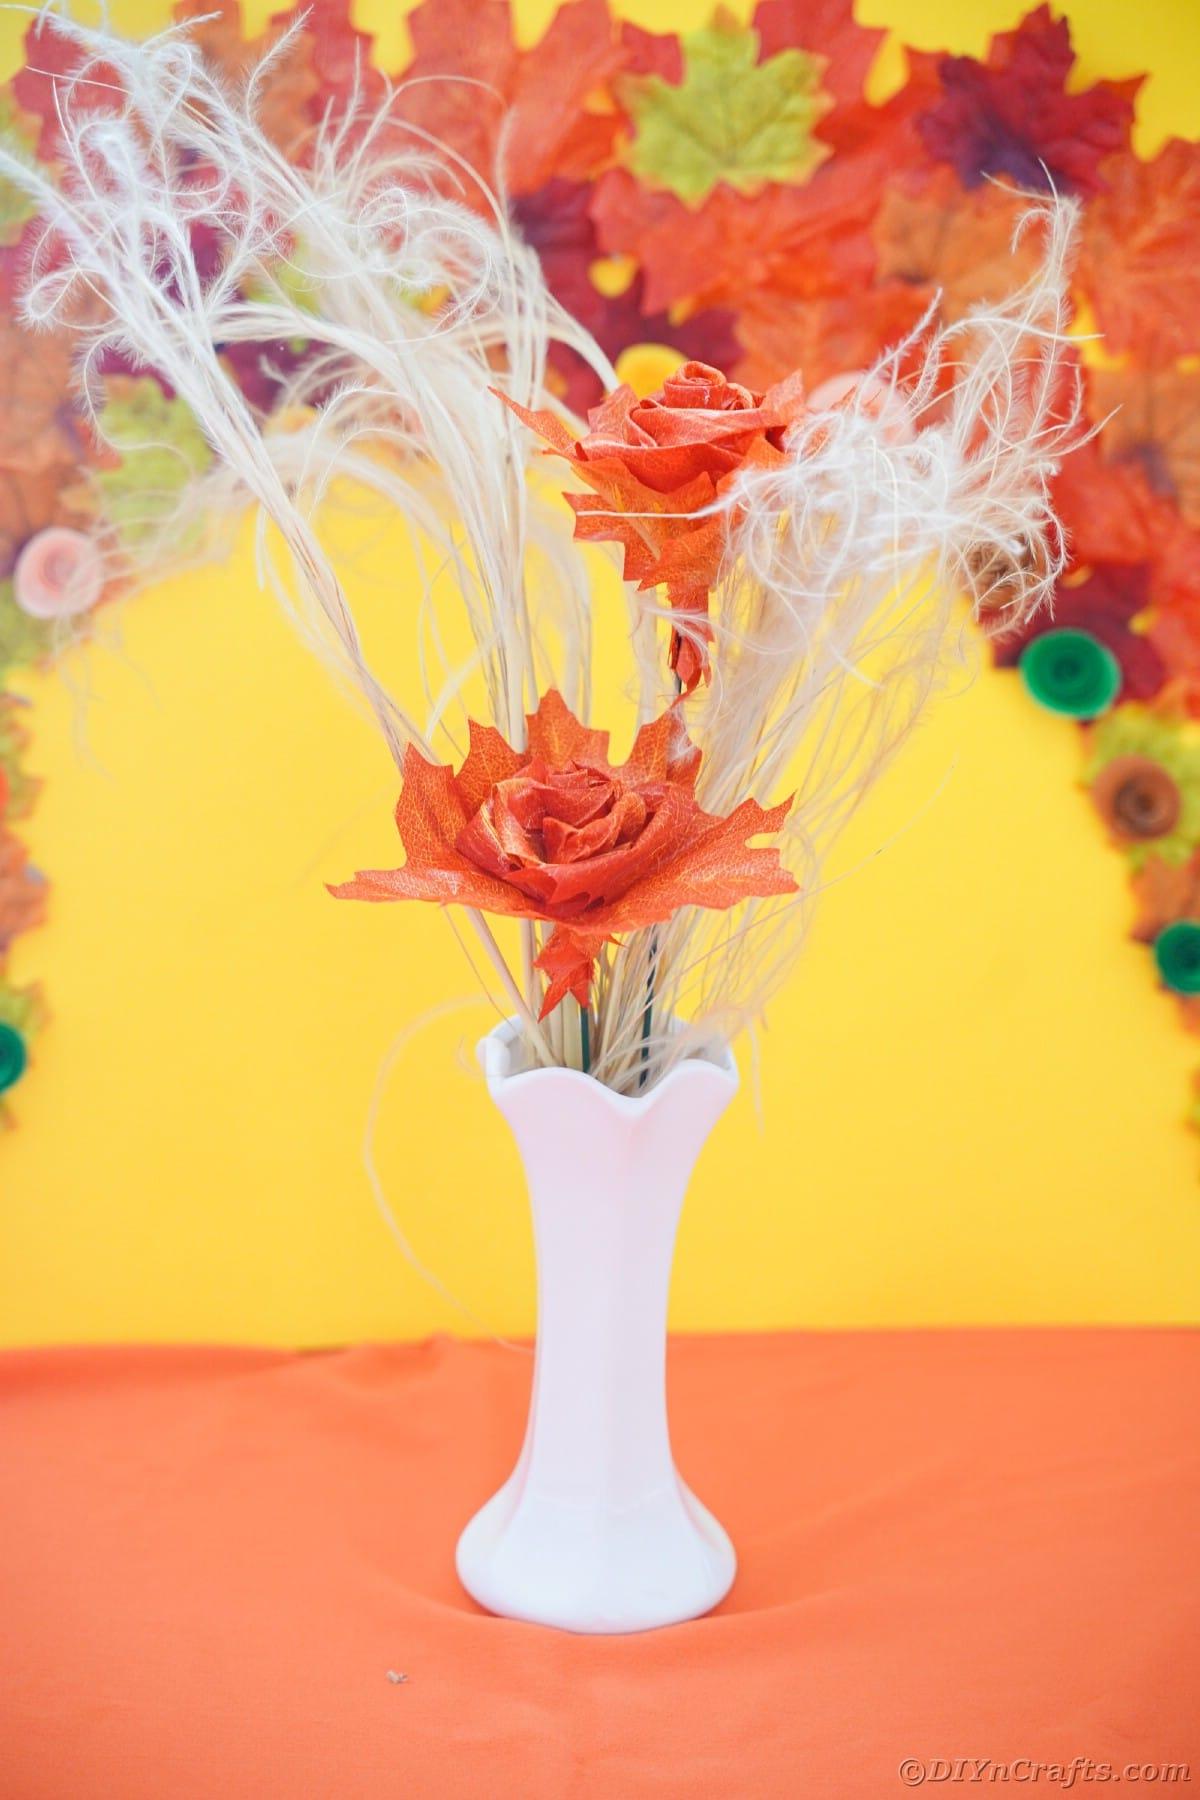 Orange leaf rose and white branches in white vase